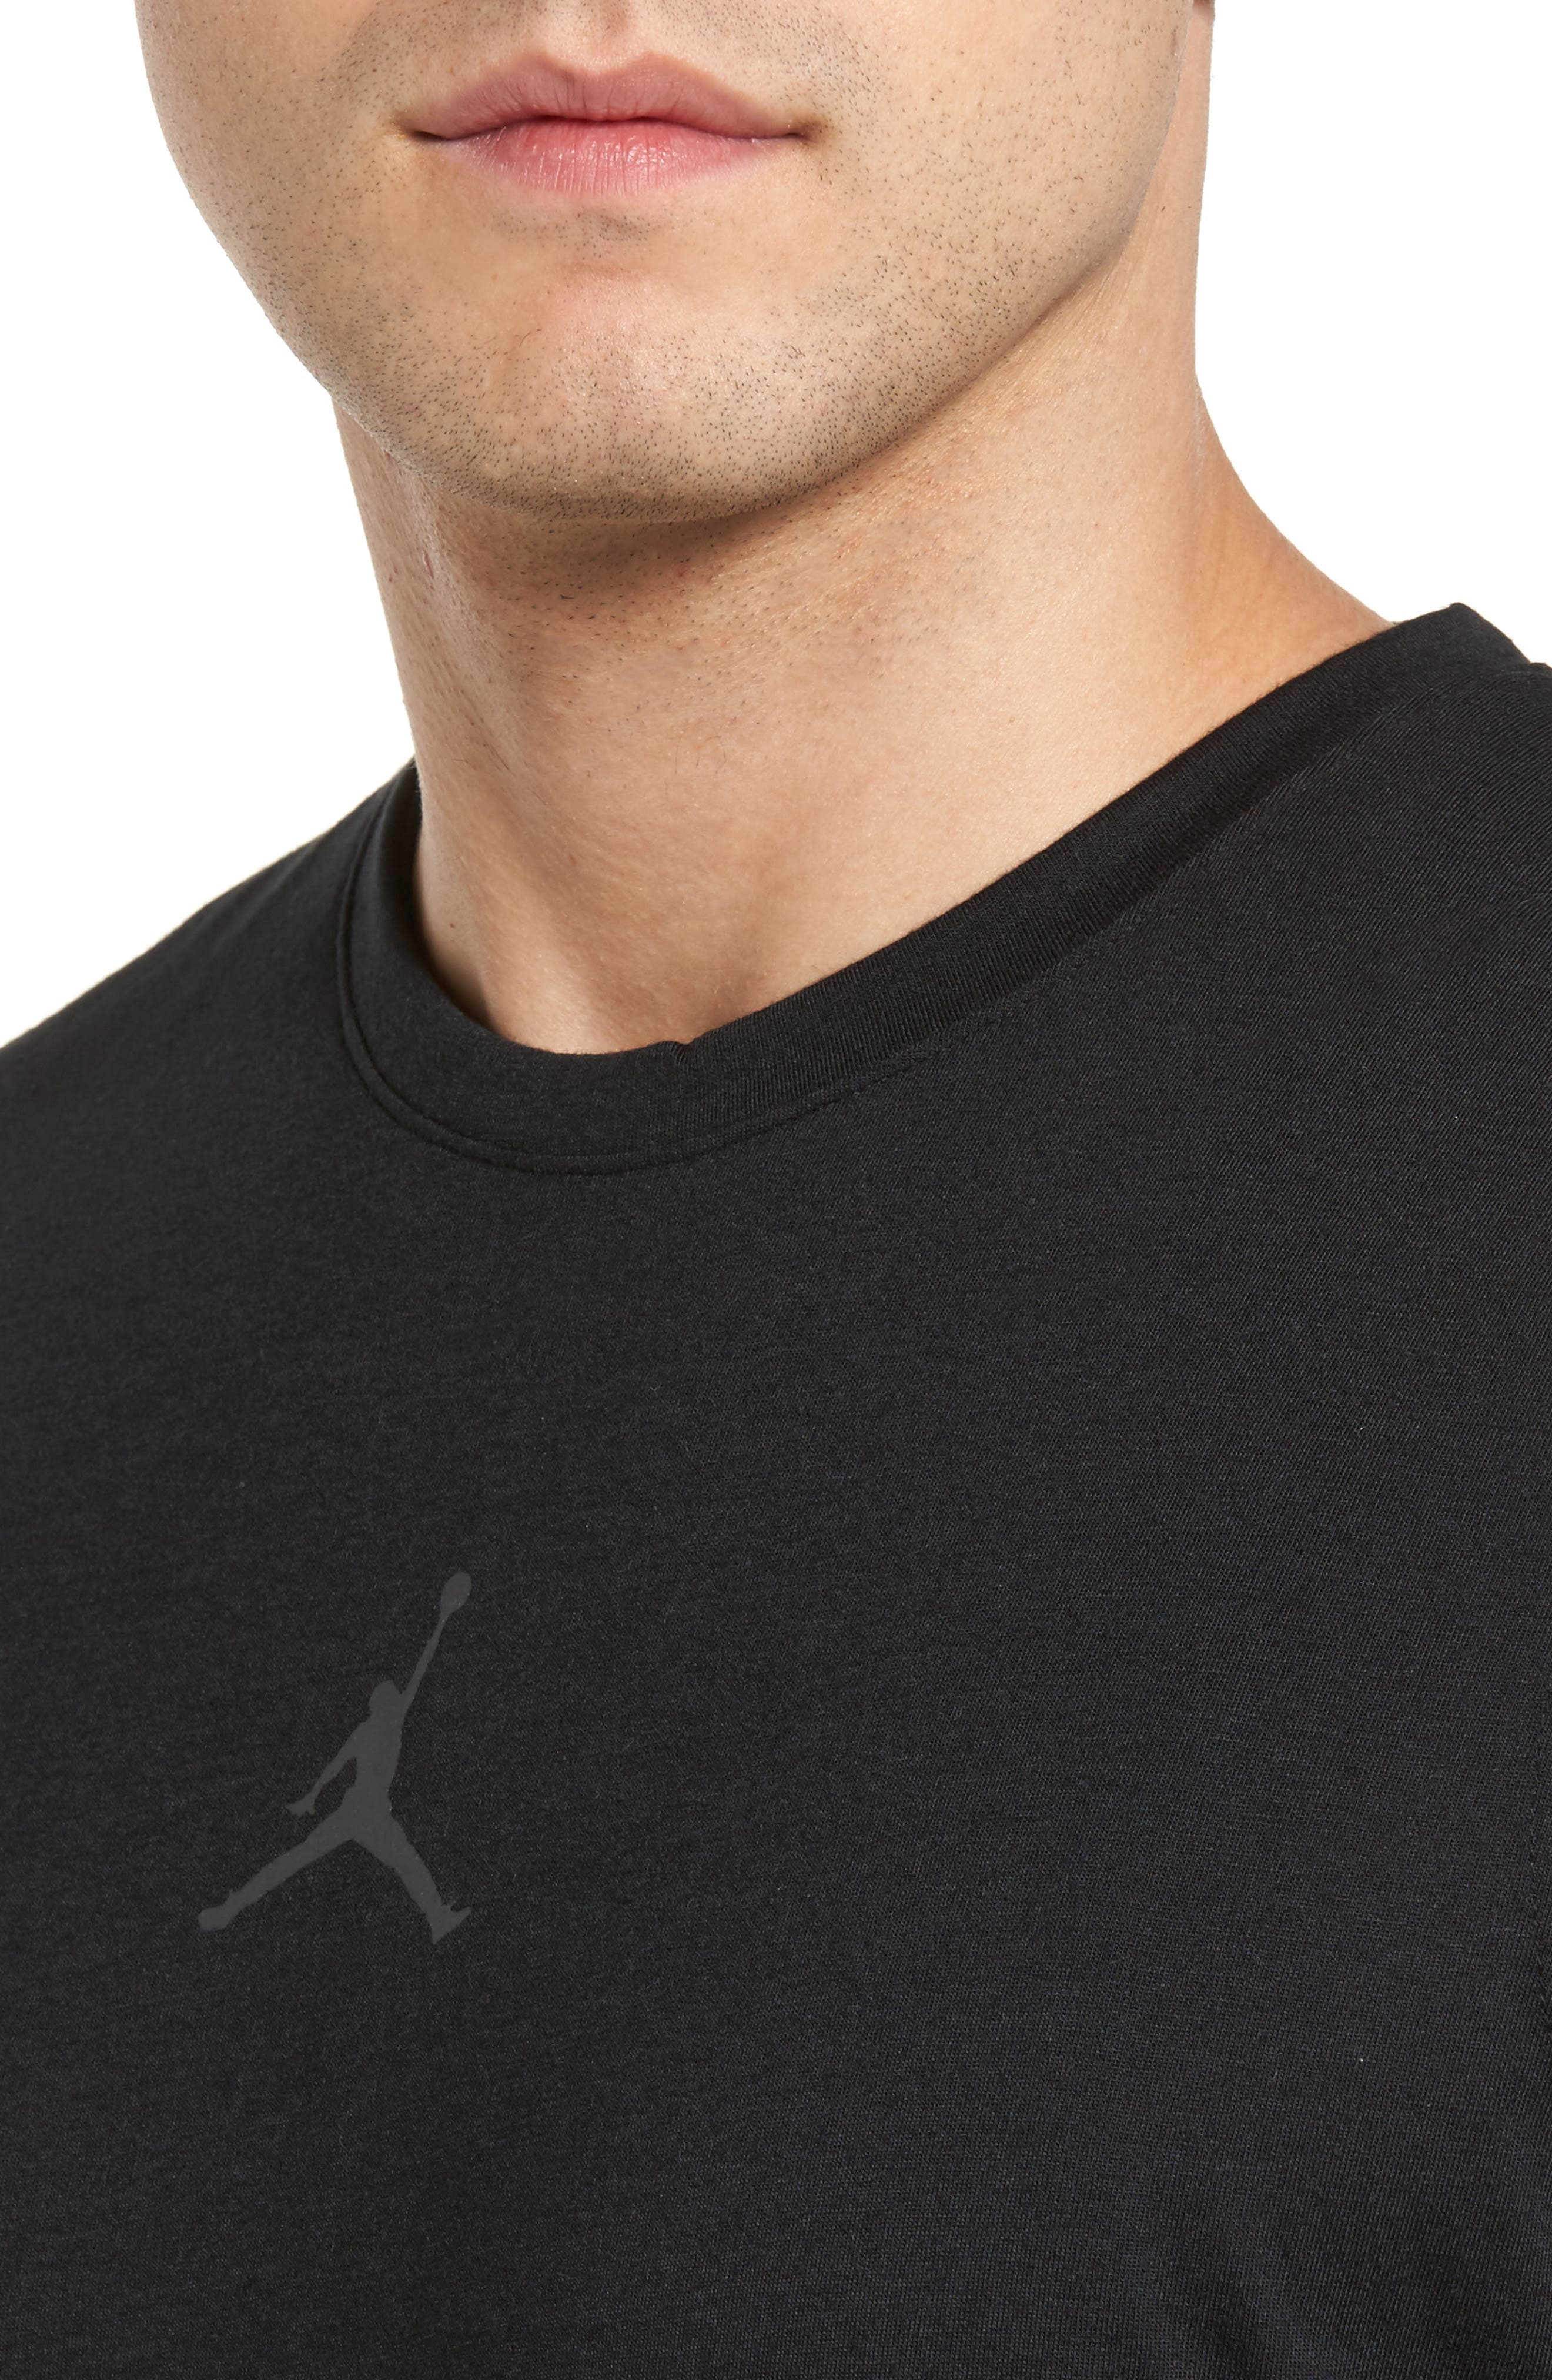 23 Alpha Dry T-Shirt,                             Alternate thumbnail 4, color,